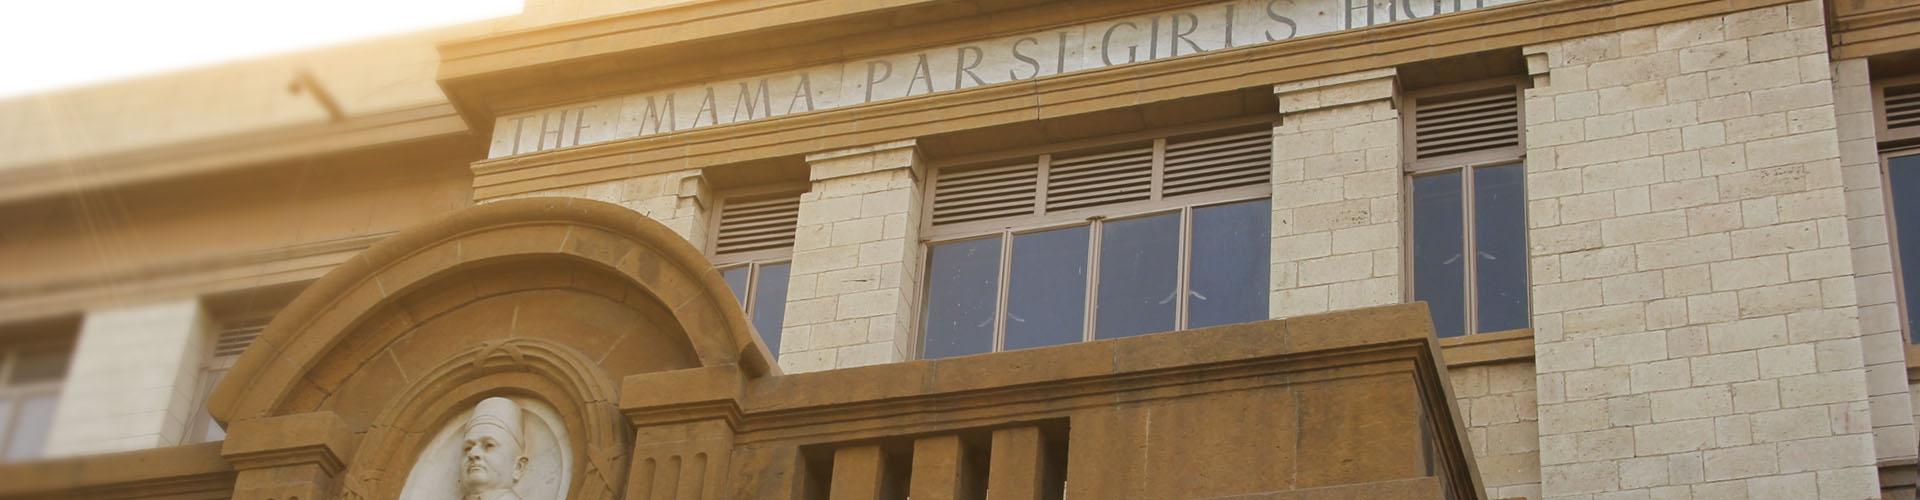 The Mama Parsi Girls' Secondary School